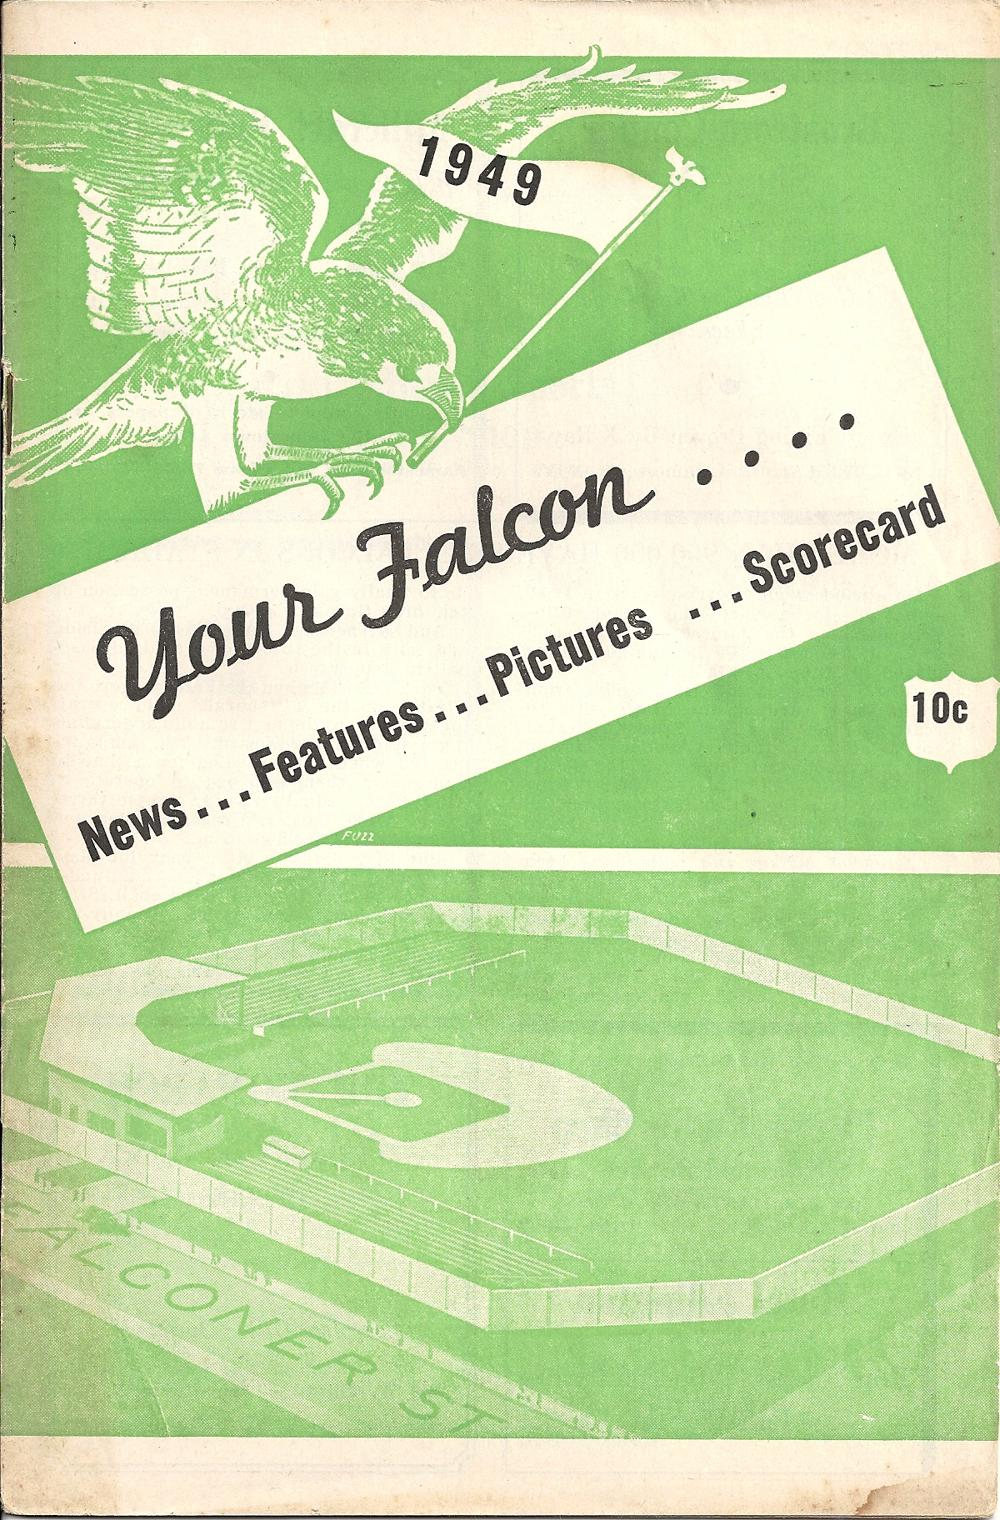 1949 Jamestown Falcons Program